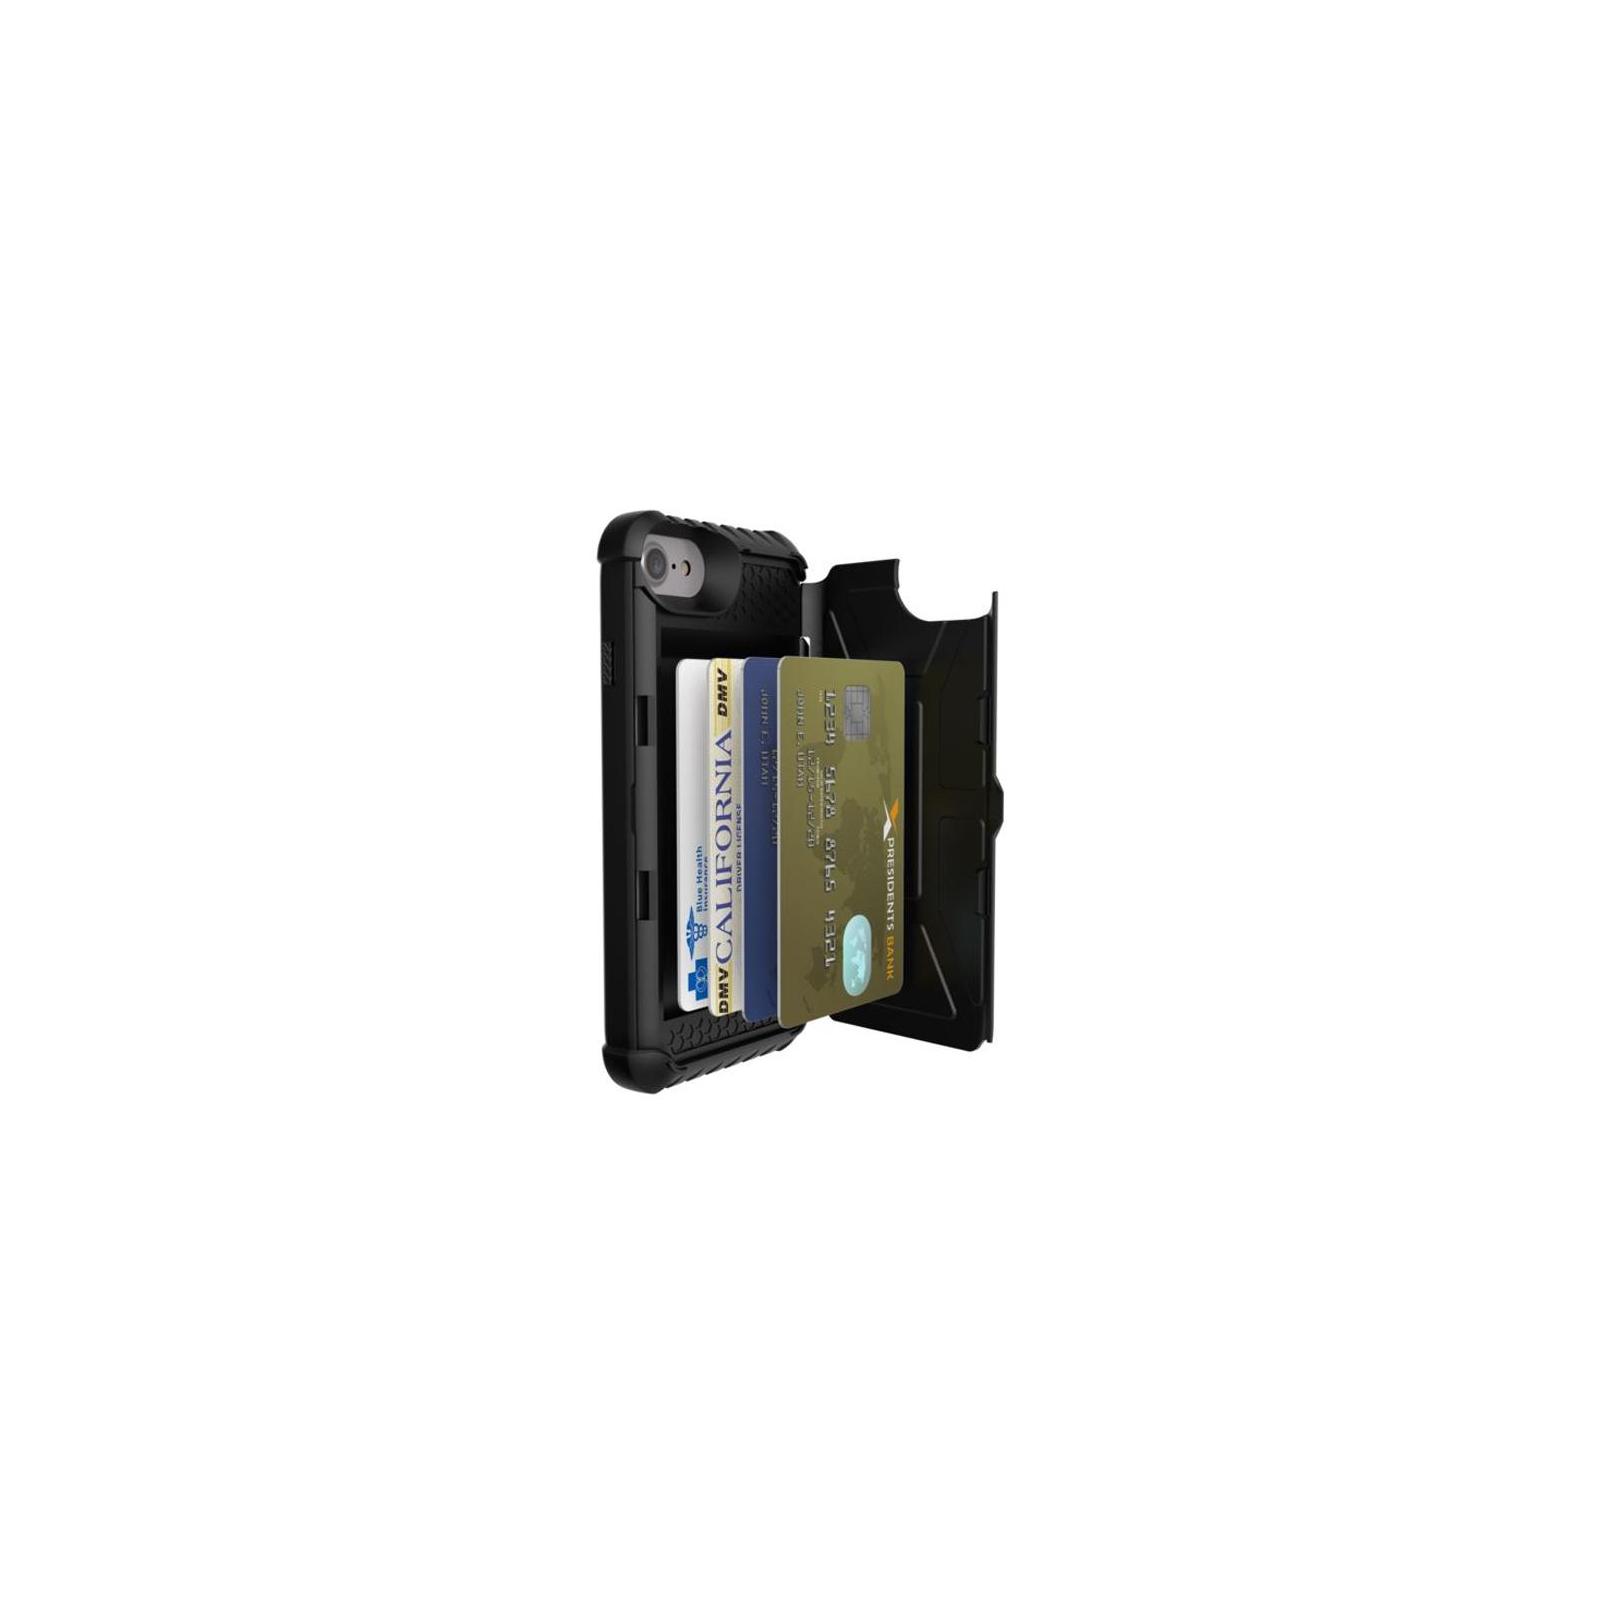 Чехол для моб. телефона Uag iPhone 8/7/6S/6 Trooper Case Black (IPH7/6S-T-BK) изображение 3